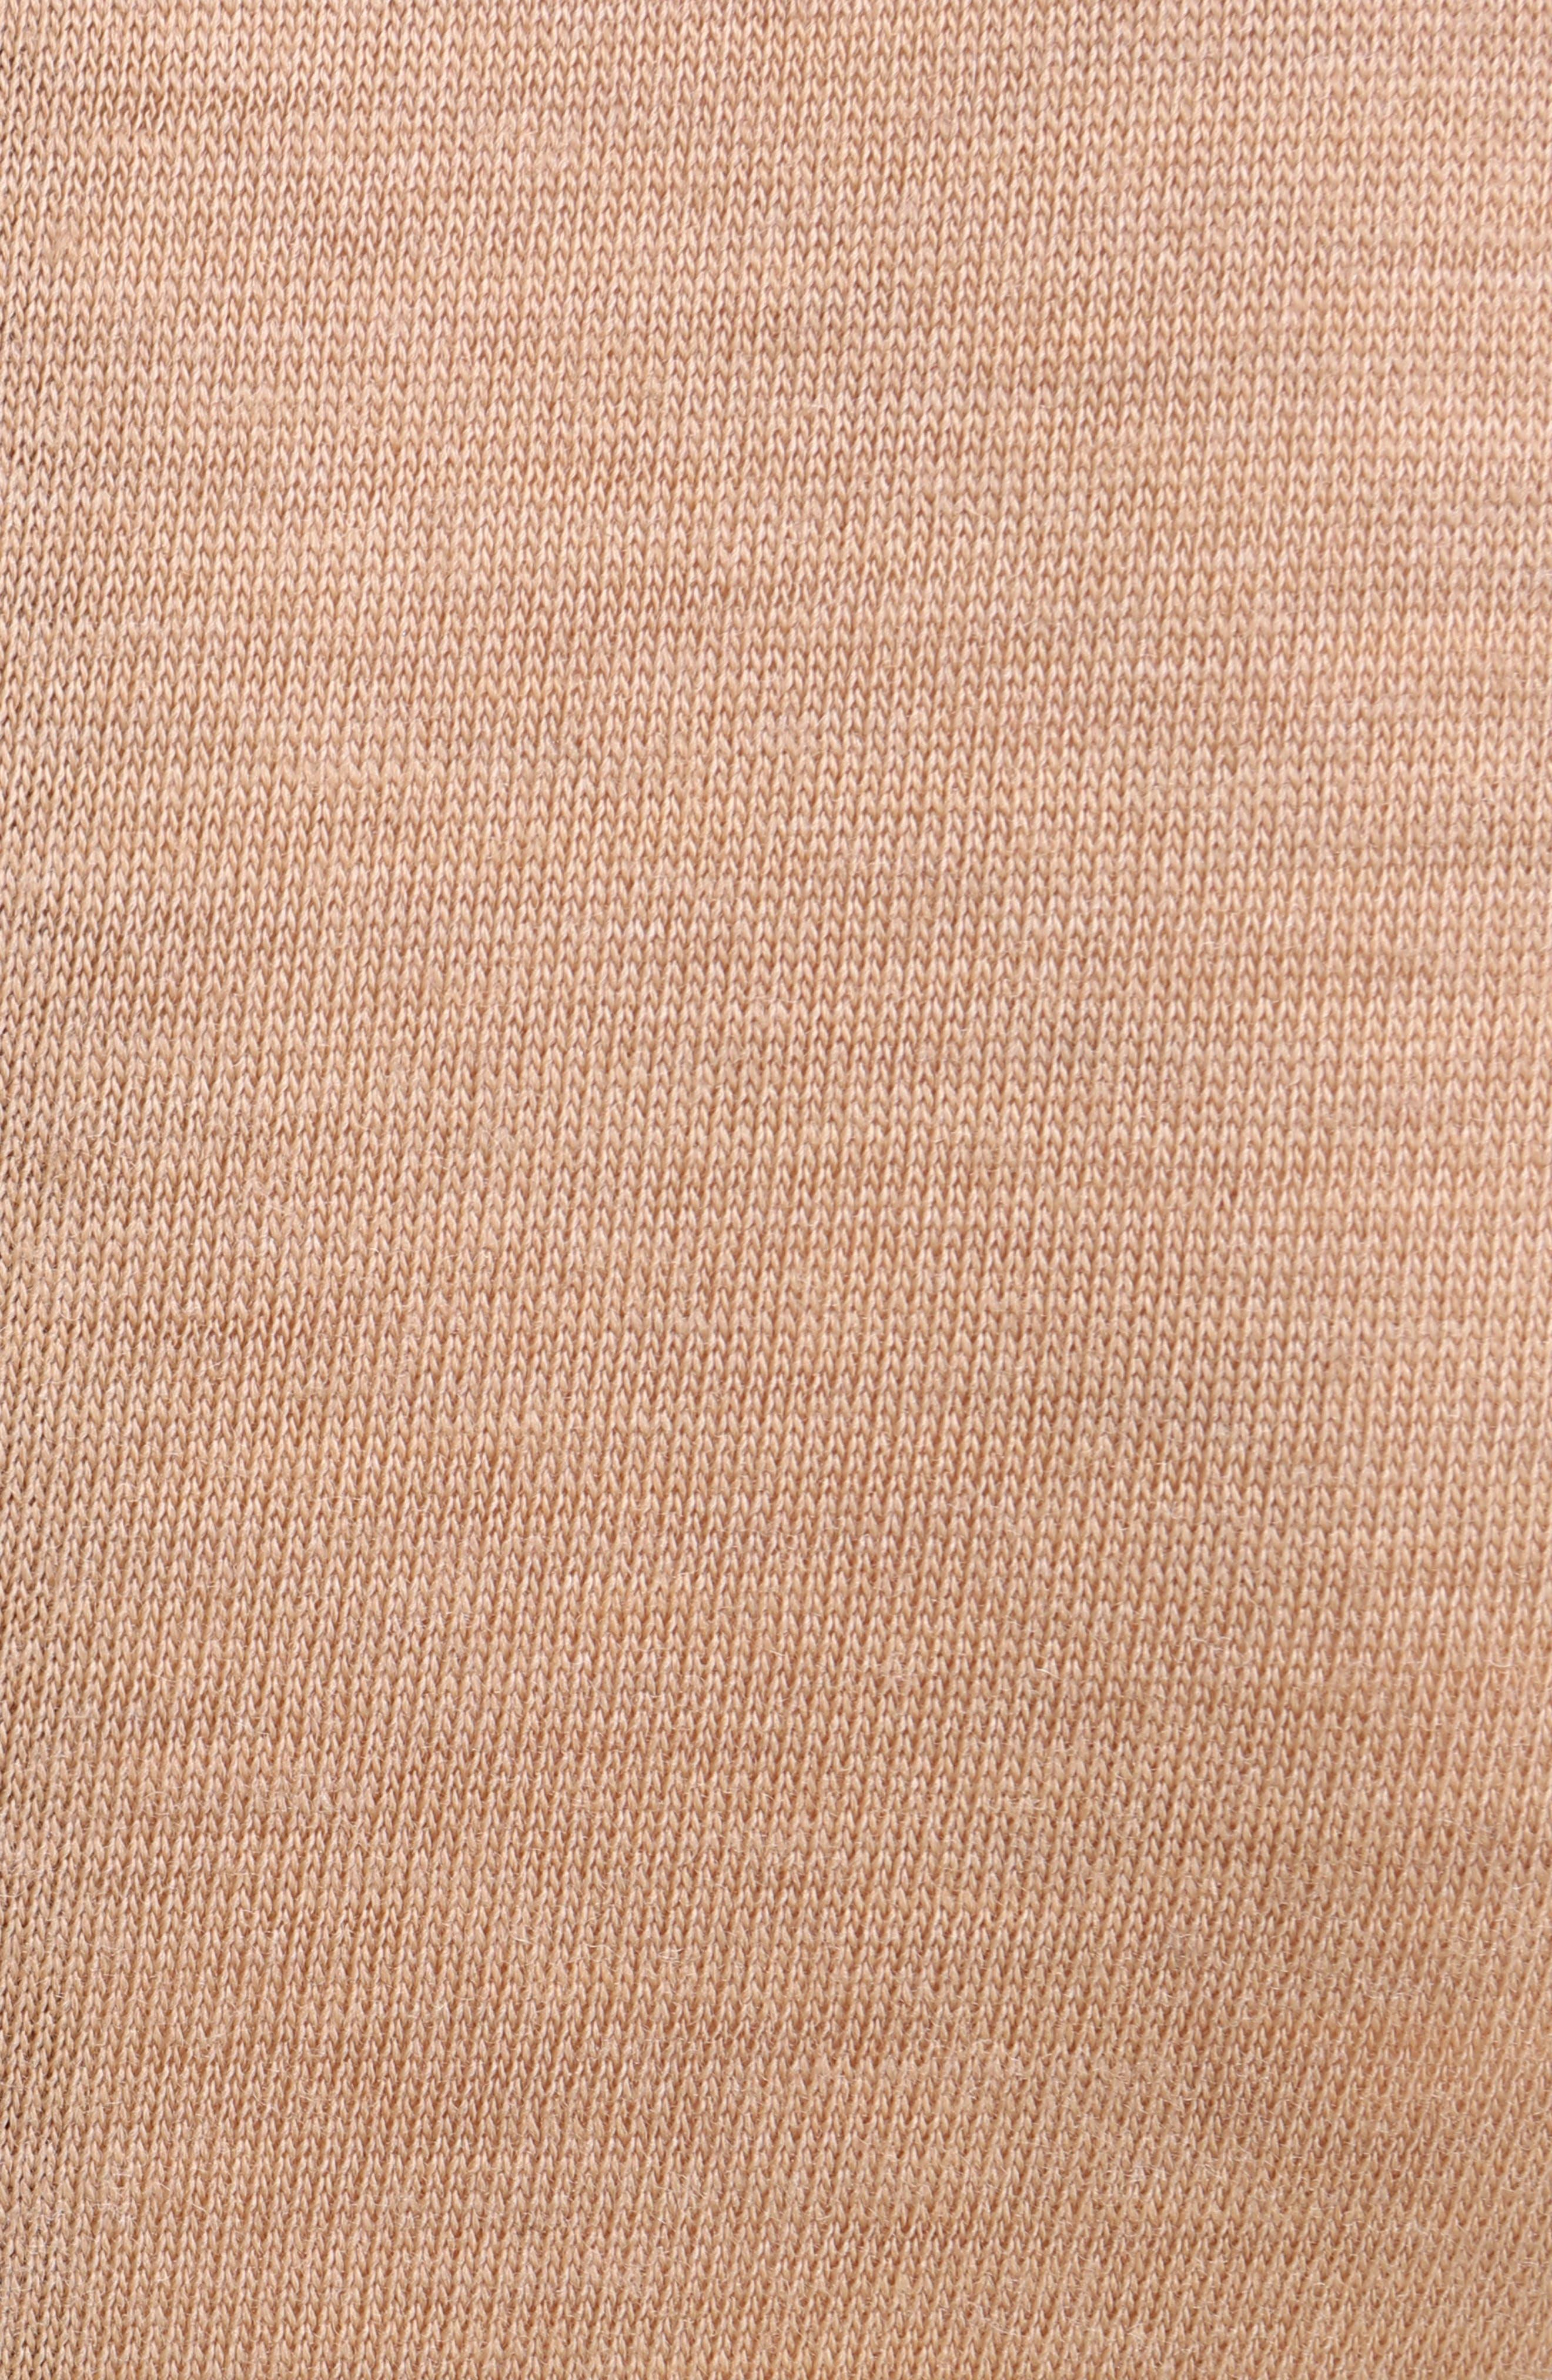 Ruffled Wool Sweatshirt,                             Alternate thumbnail 5, color,                             280